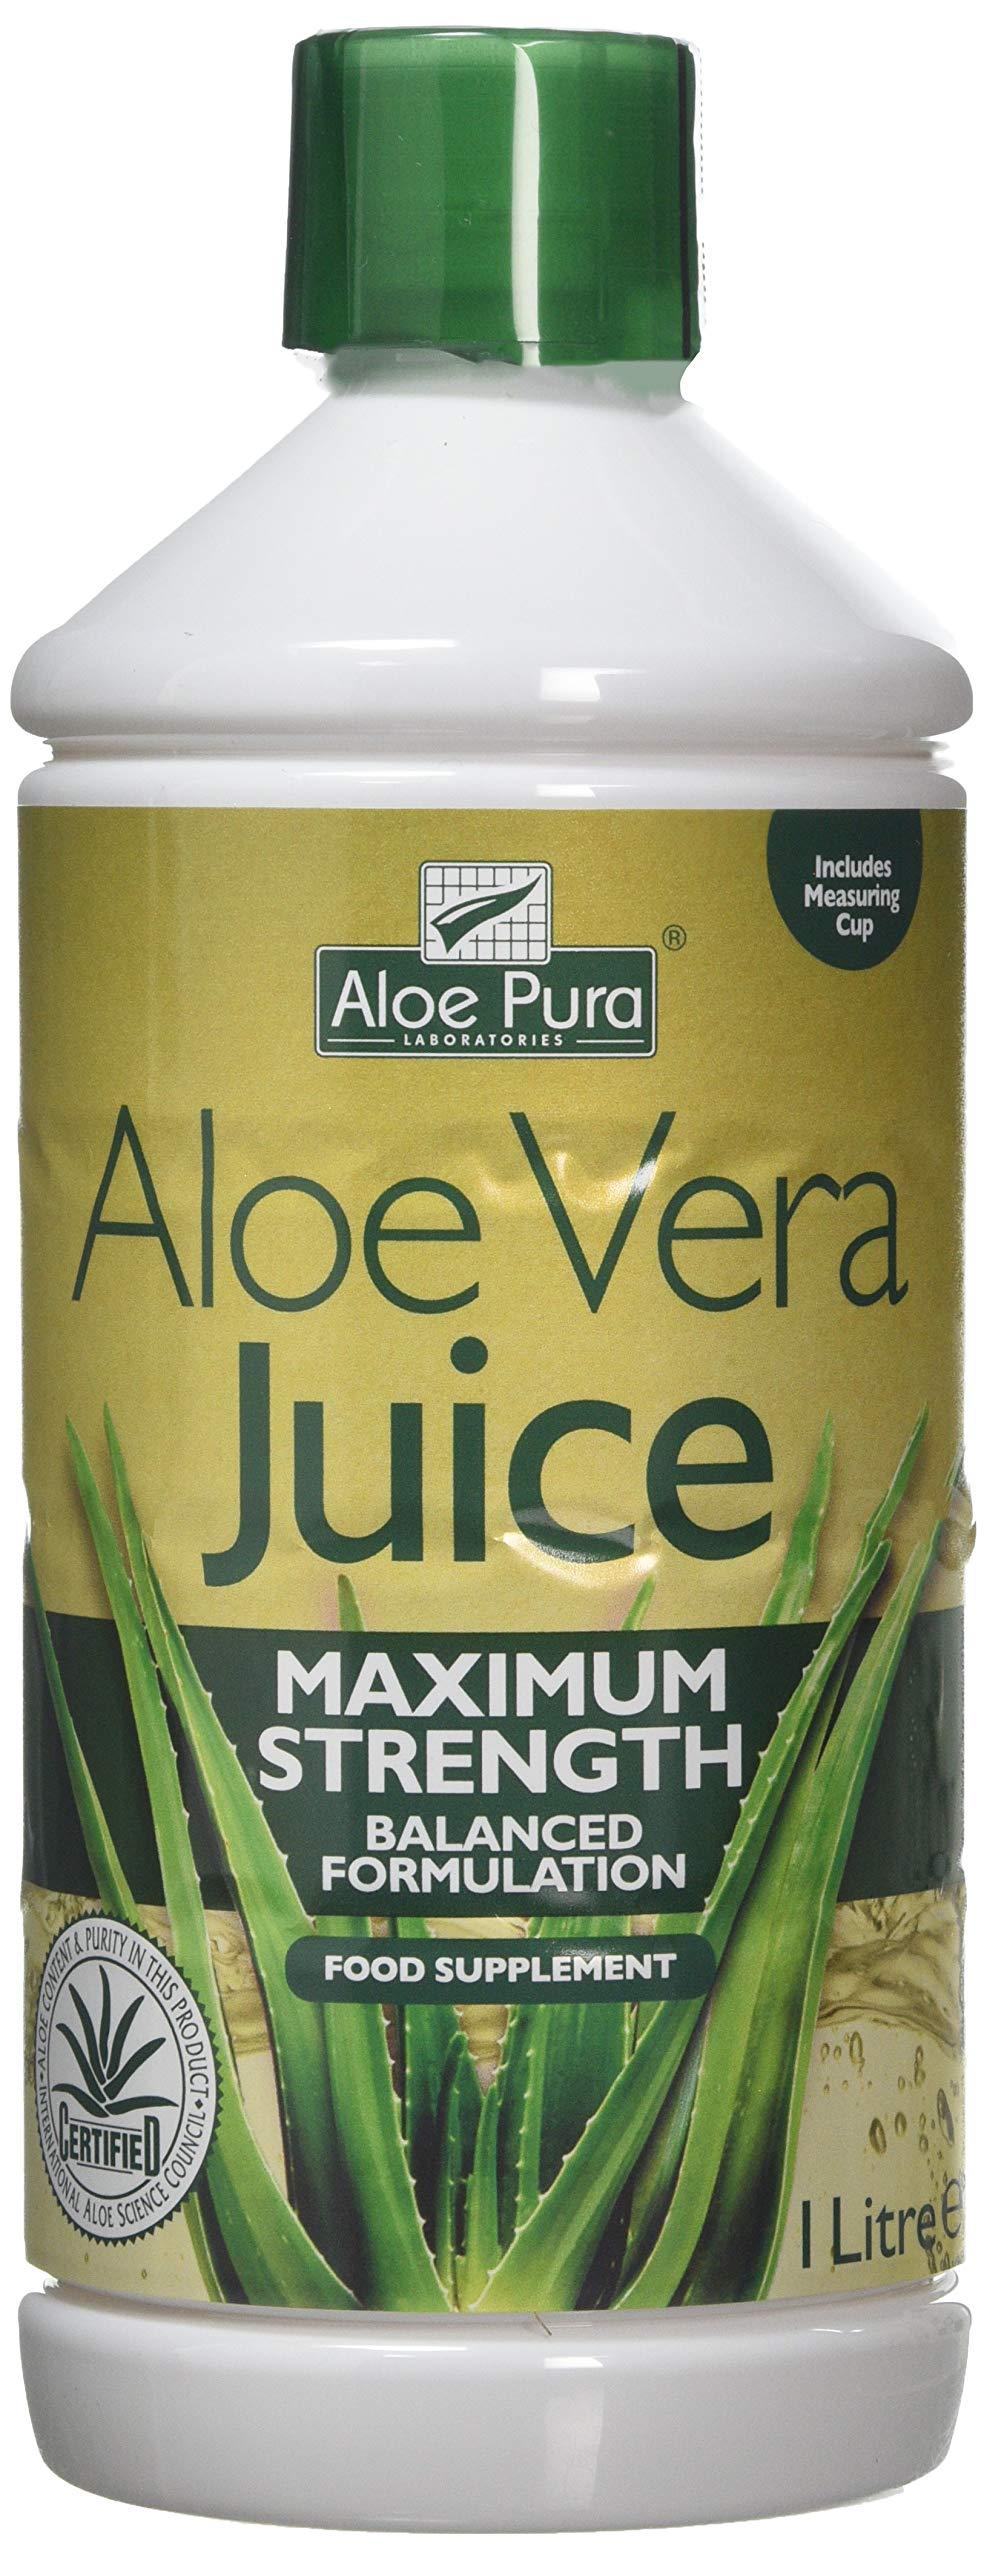 Aloe Vera Juice Max Strength - 1litre 1